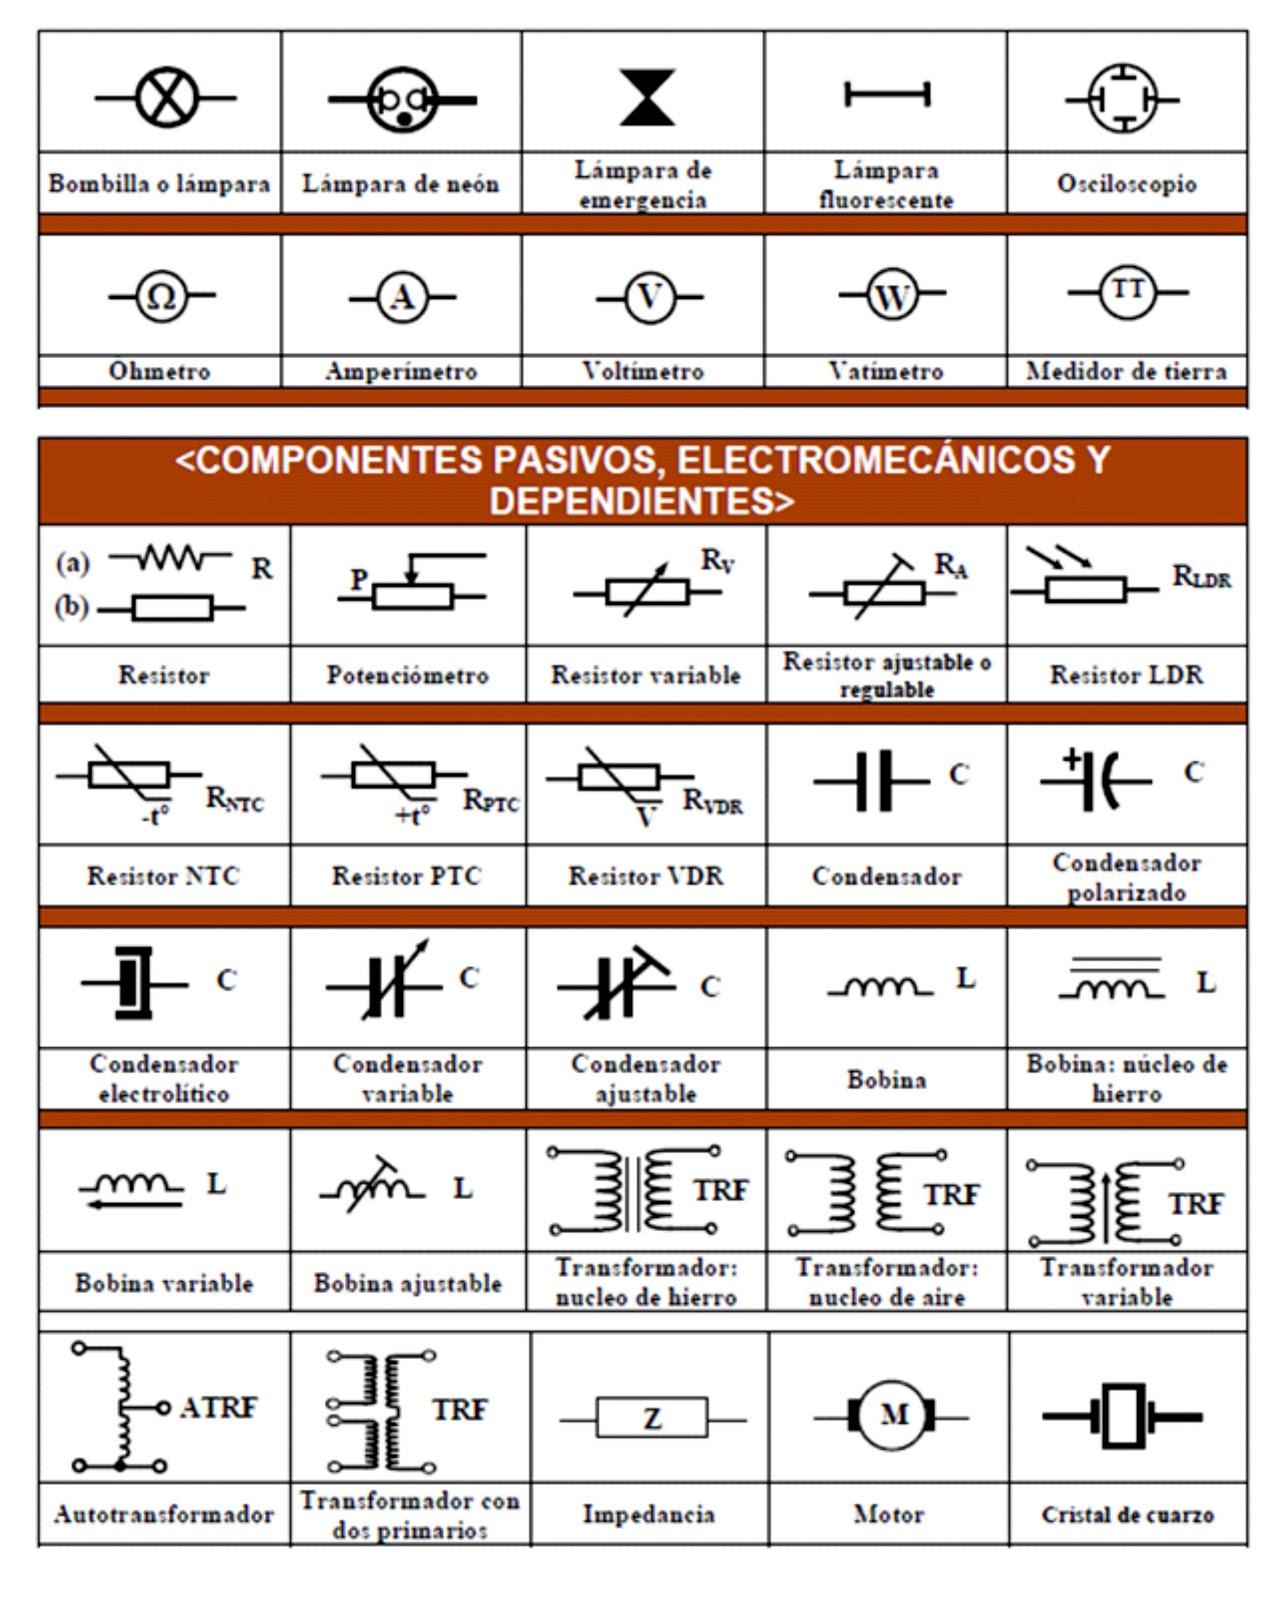 Multimetro digital simbolos electronicos basicos for Clasificacion de los planos arquitectonicos